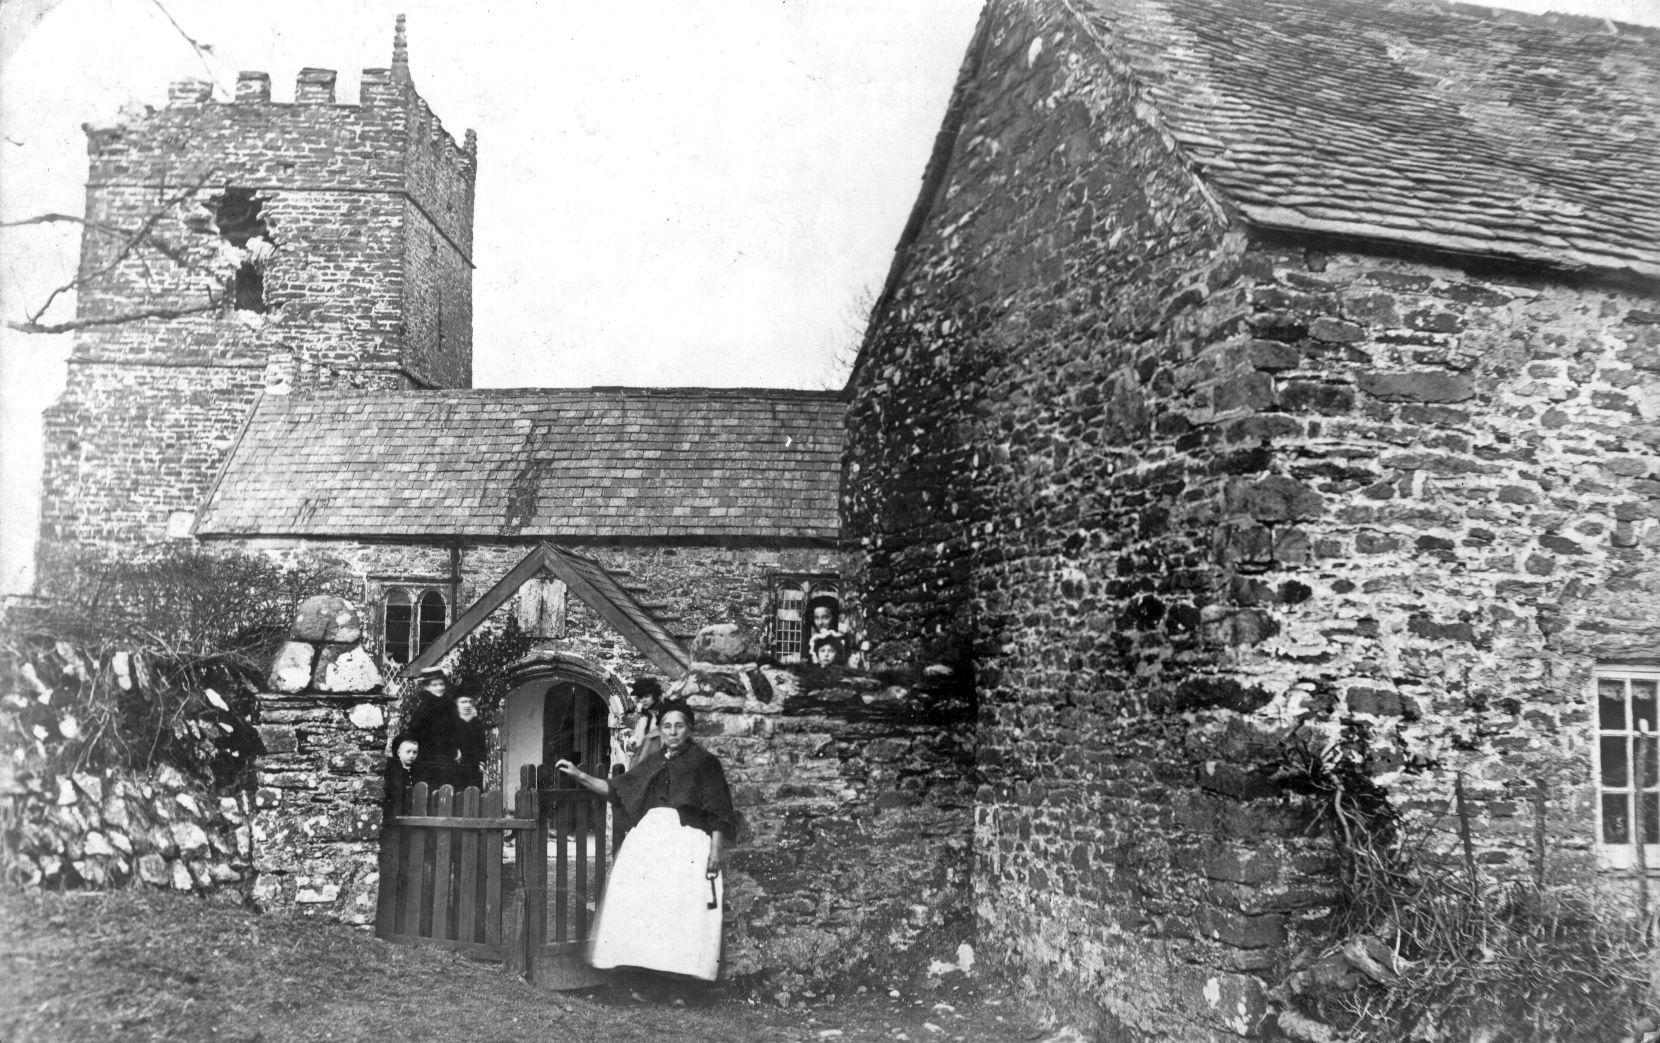 St. Petrocks Church, Parracombe, Devon.  January 1908 struck by lightening - Kind permission of Phillip Petherick